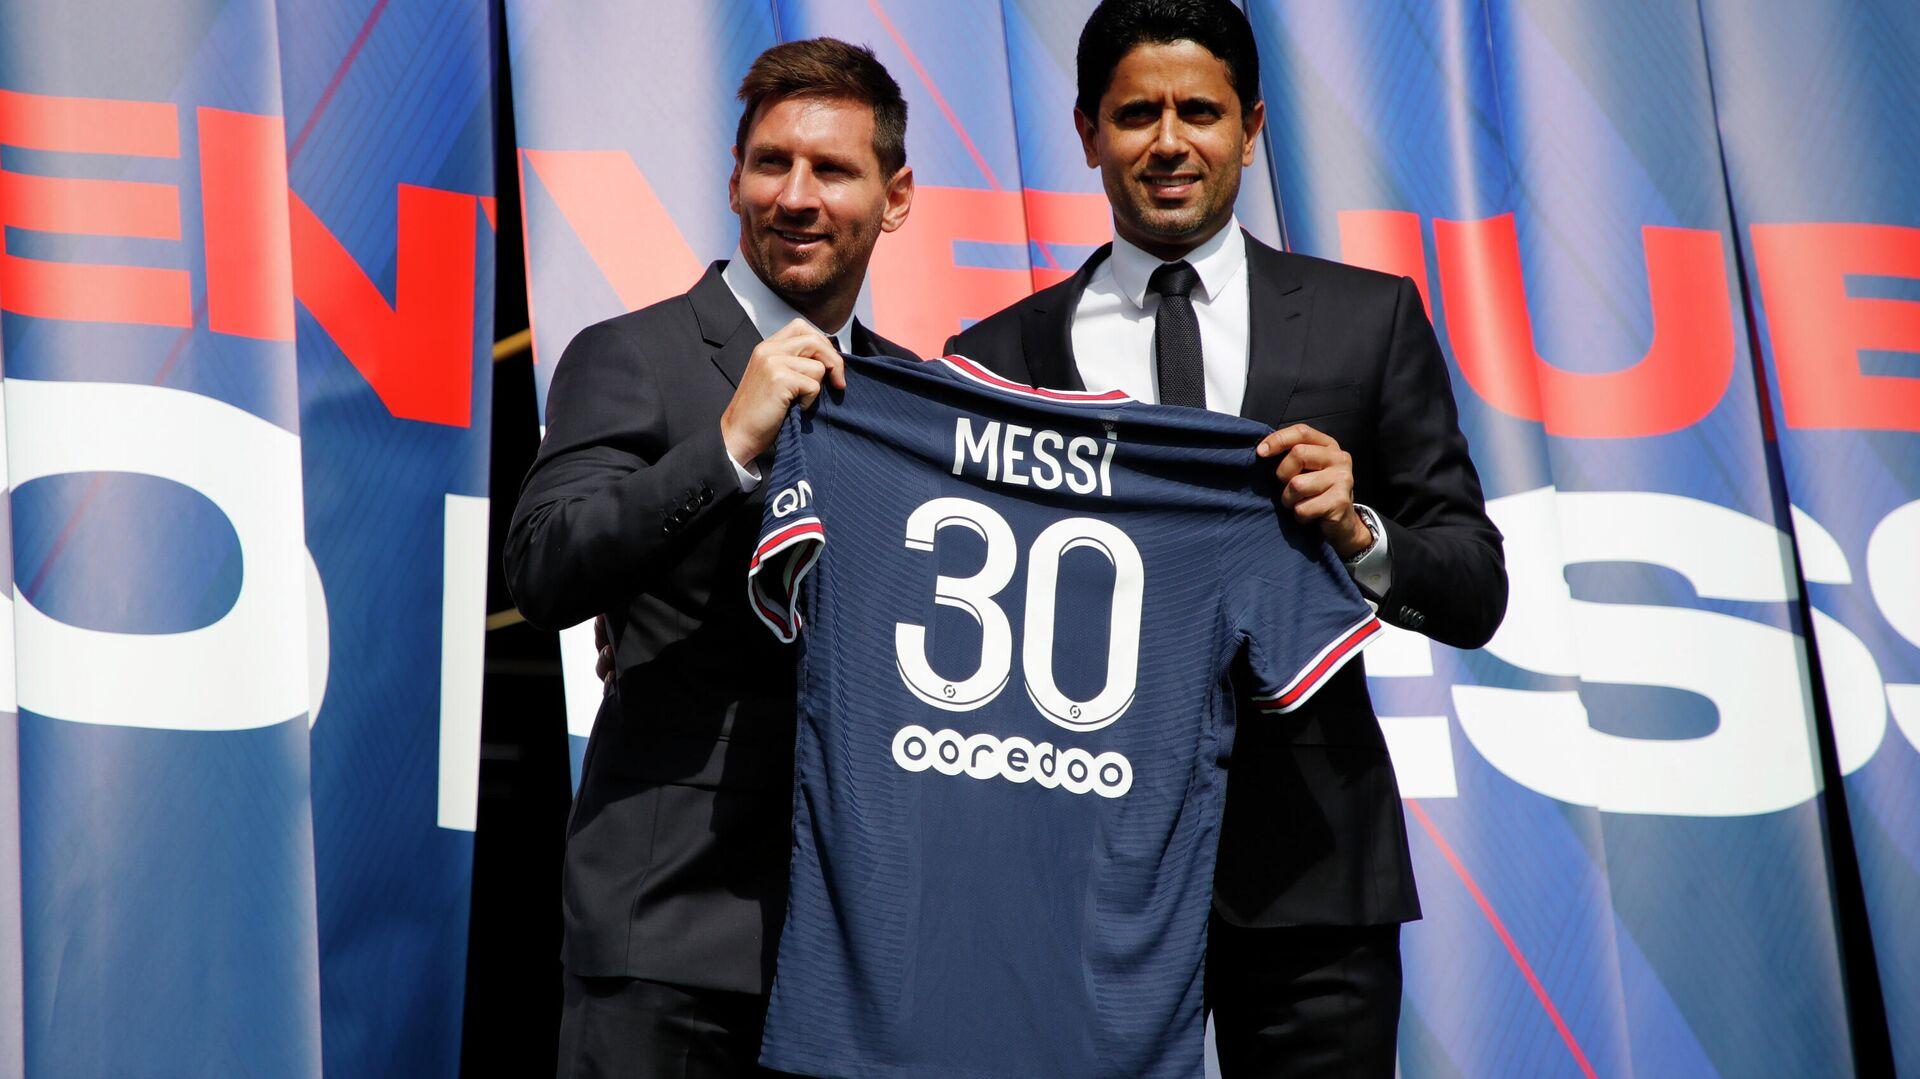 Lionel Messi y el presidente del PSG, Nasser Al-Khelaifi - Sputnik Mundo, 1920, 07.09.2021